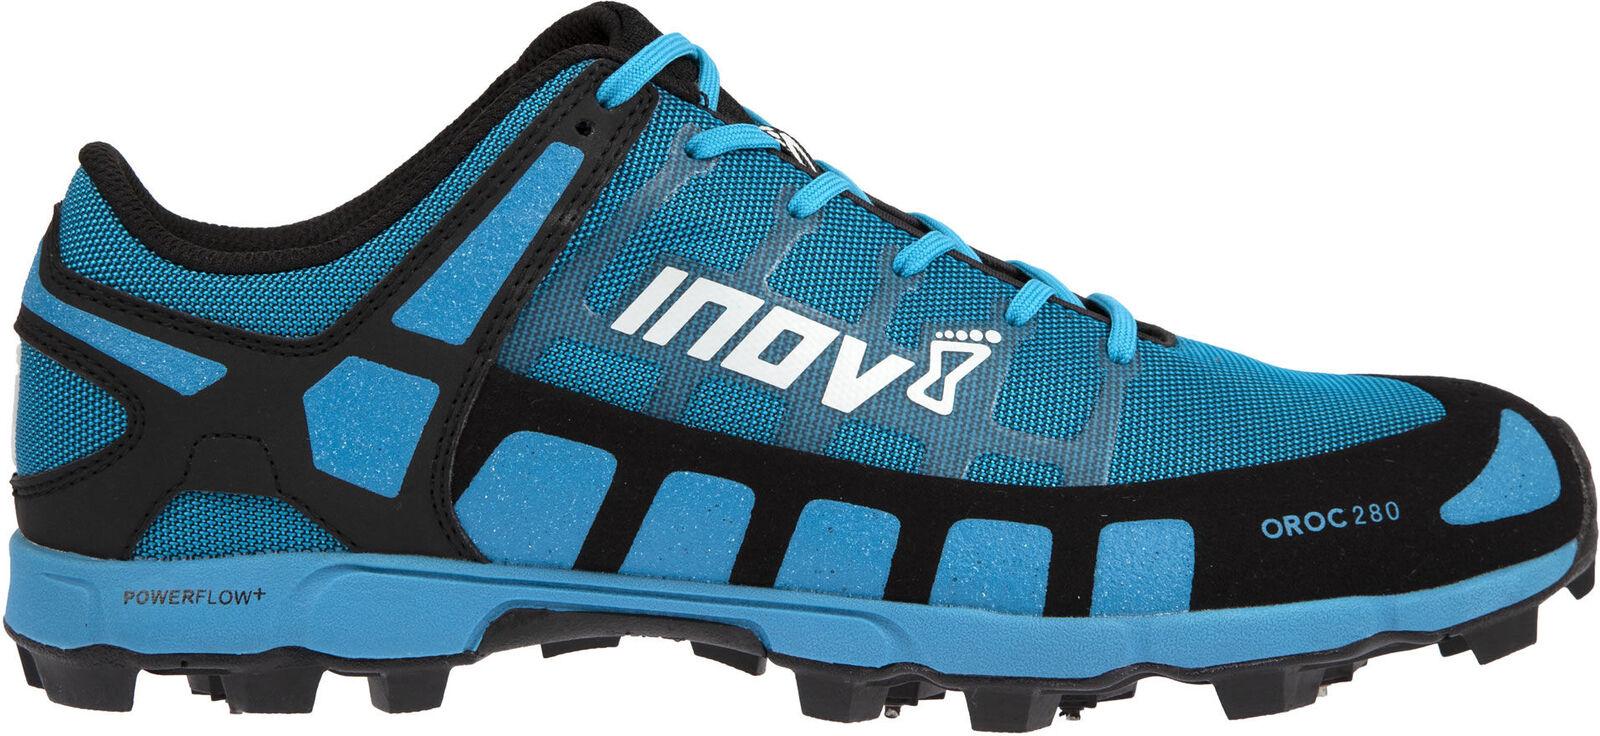 Inov8 goudc 280 V3 mannens Trail hardlopen schoenen --blauw